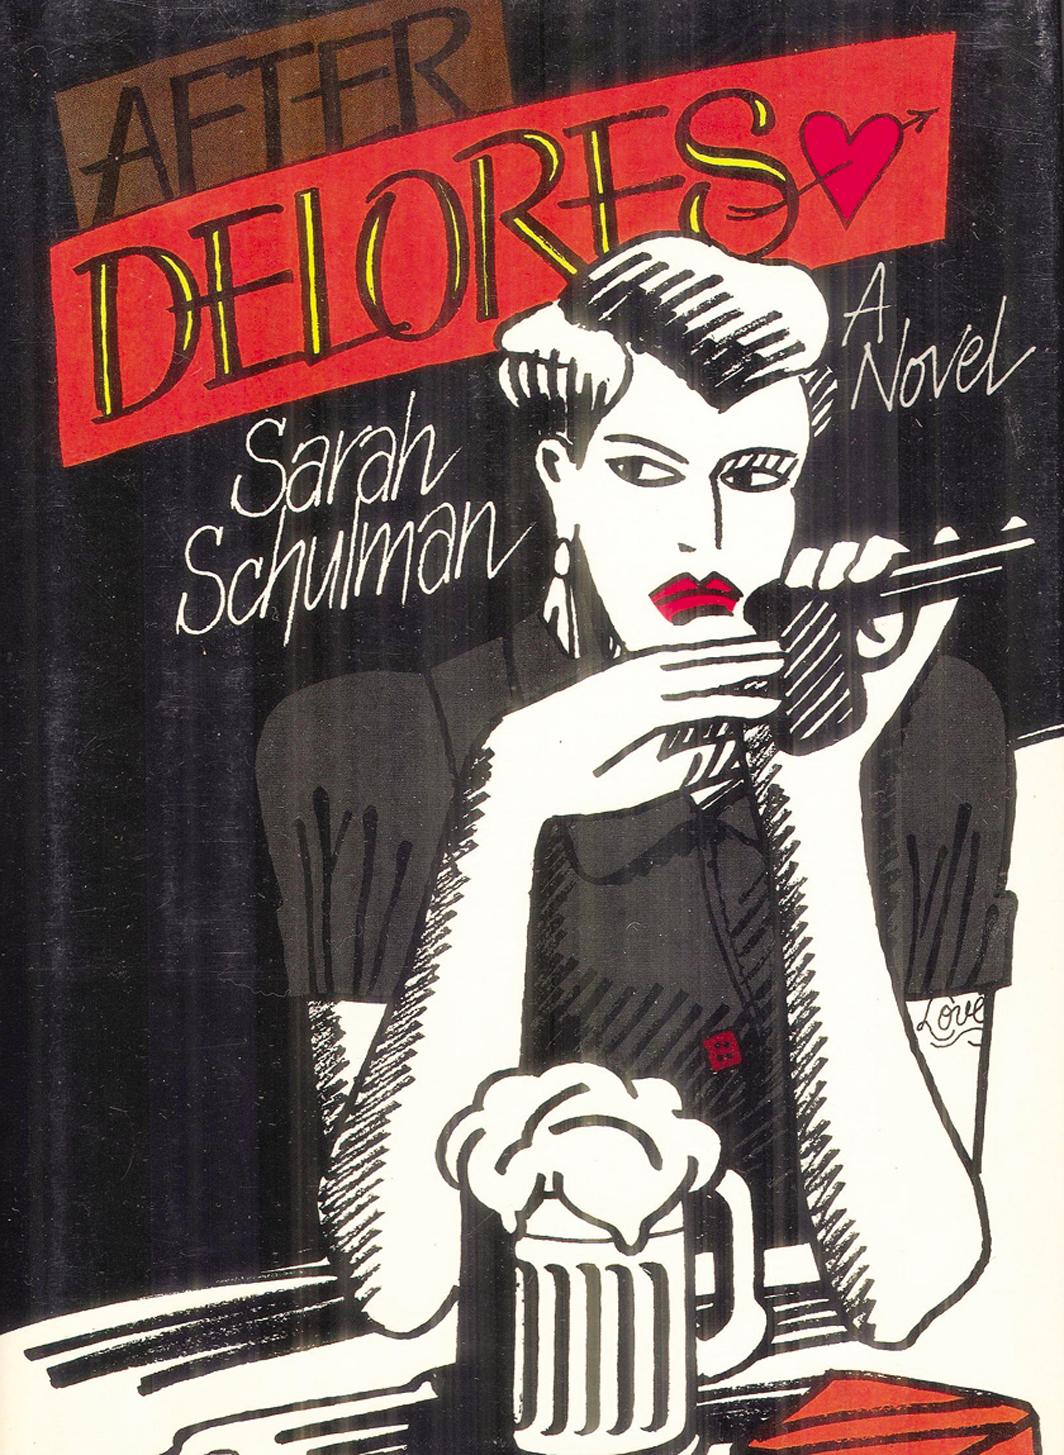 Cover of Sarah Schulman's After Delores (E. P. Dutton, 1988).